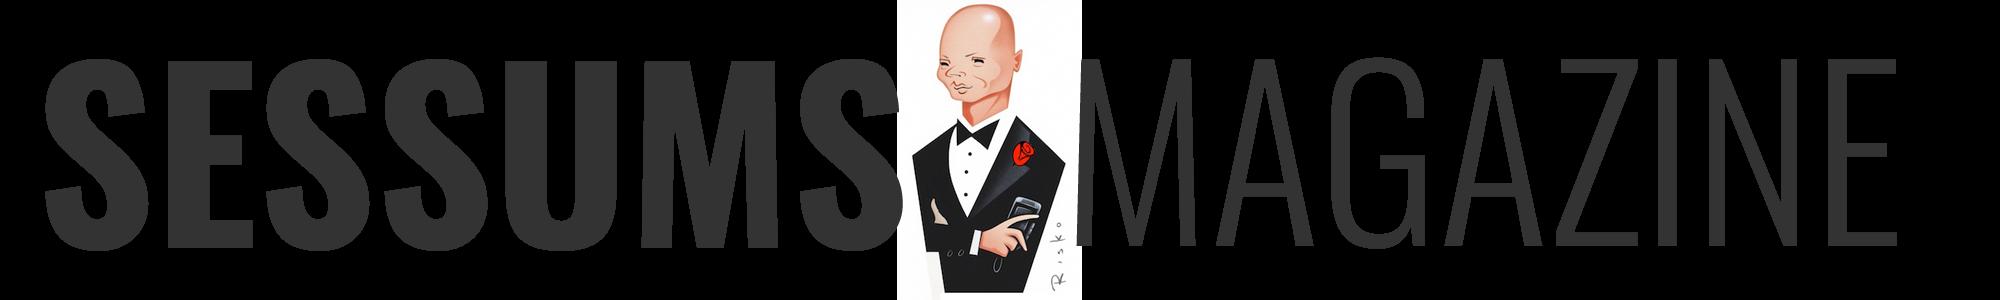 sessumsmagazine.com